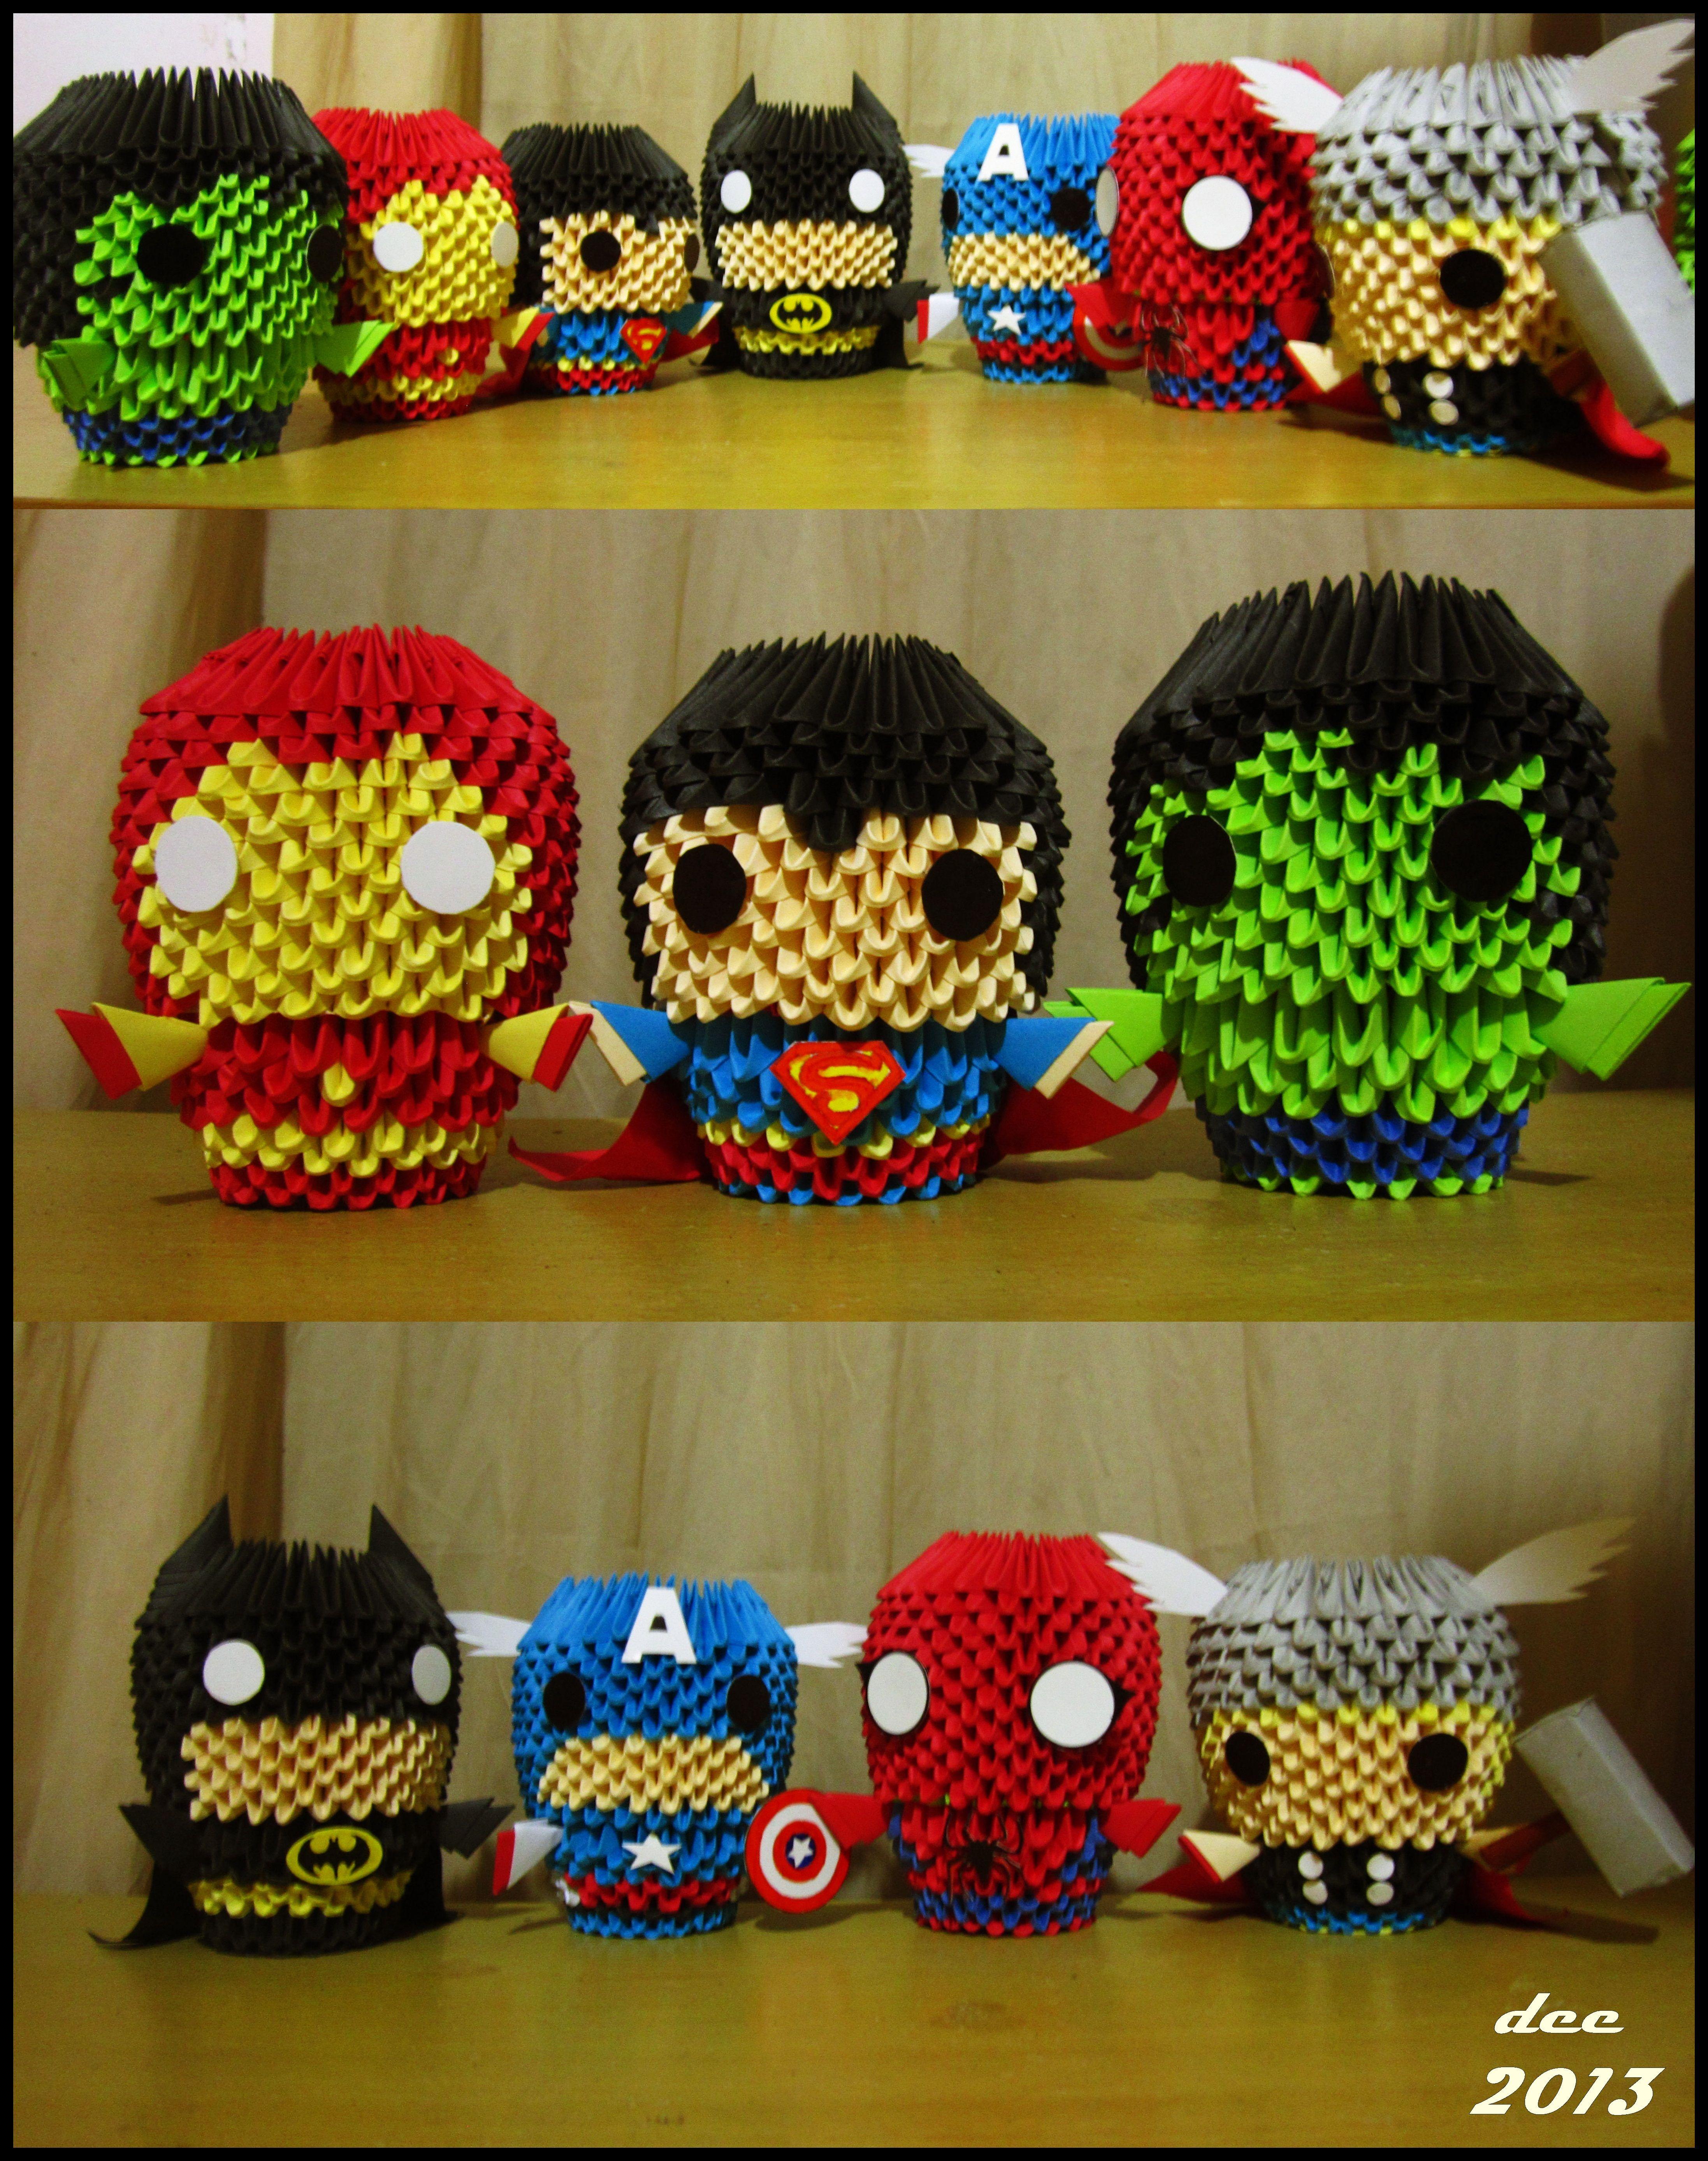 MARVEL Superheroes 3D Origami by deerexx.deviantart.com on ...